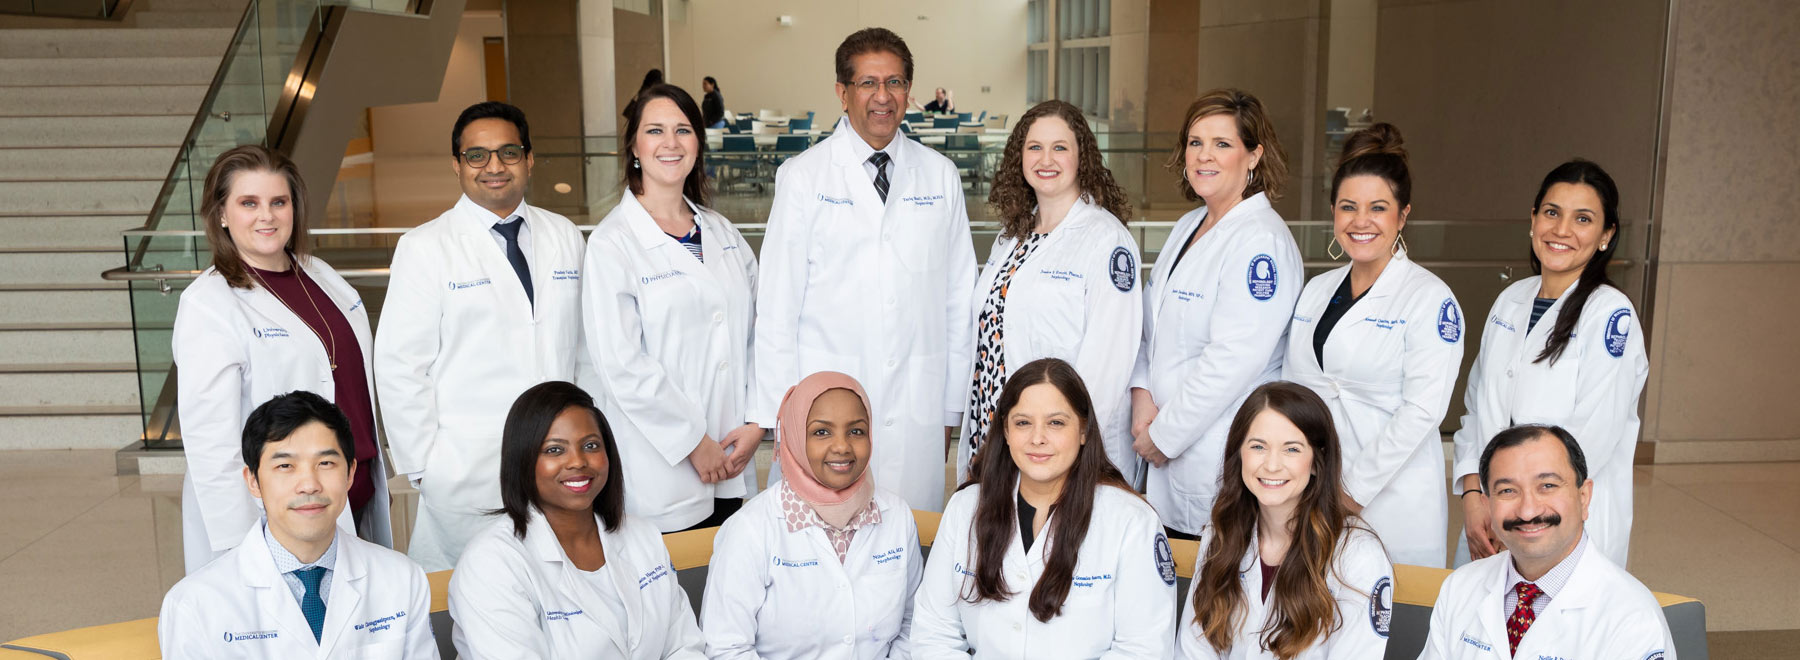 Division of Nephrology - University of Mississippi Medical Center